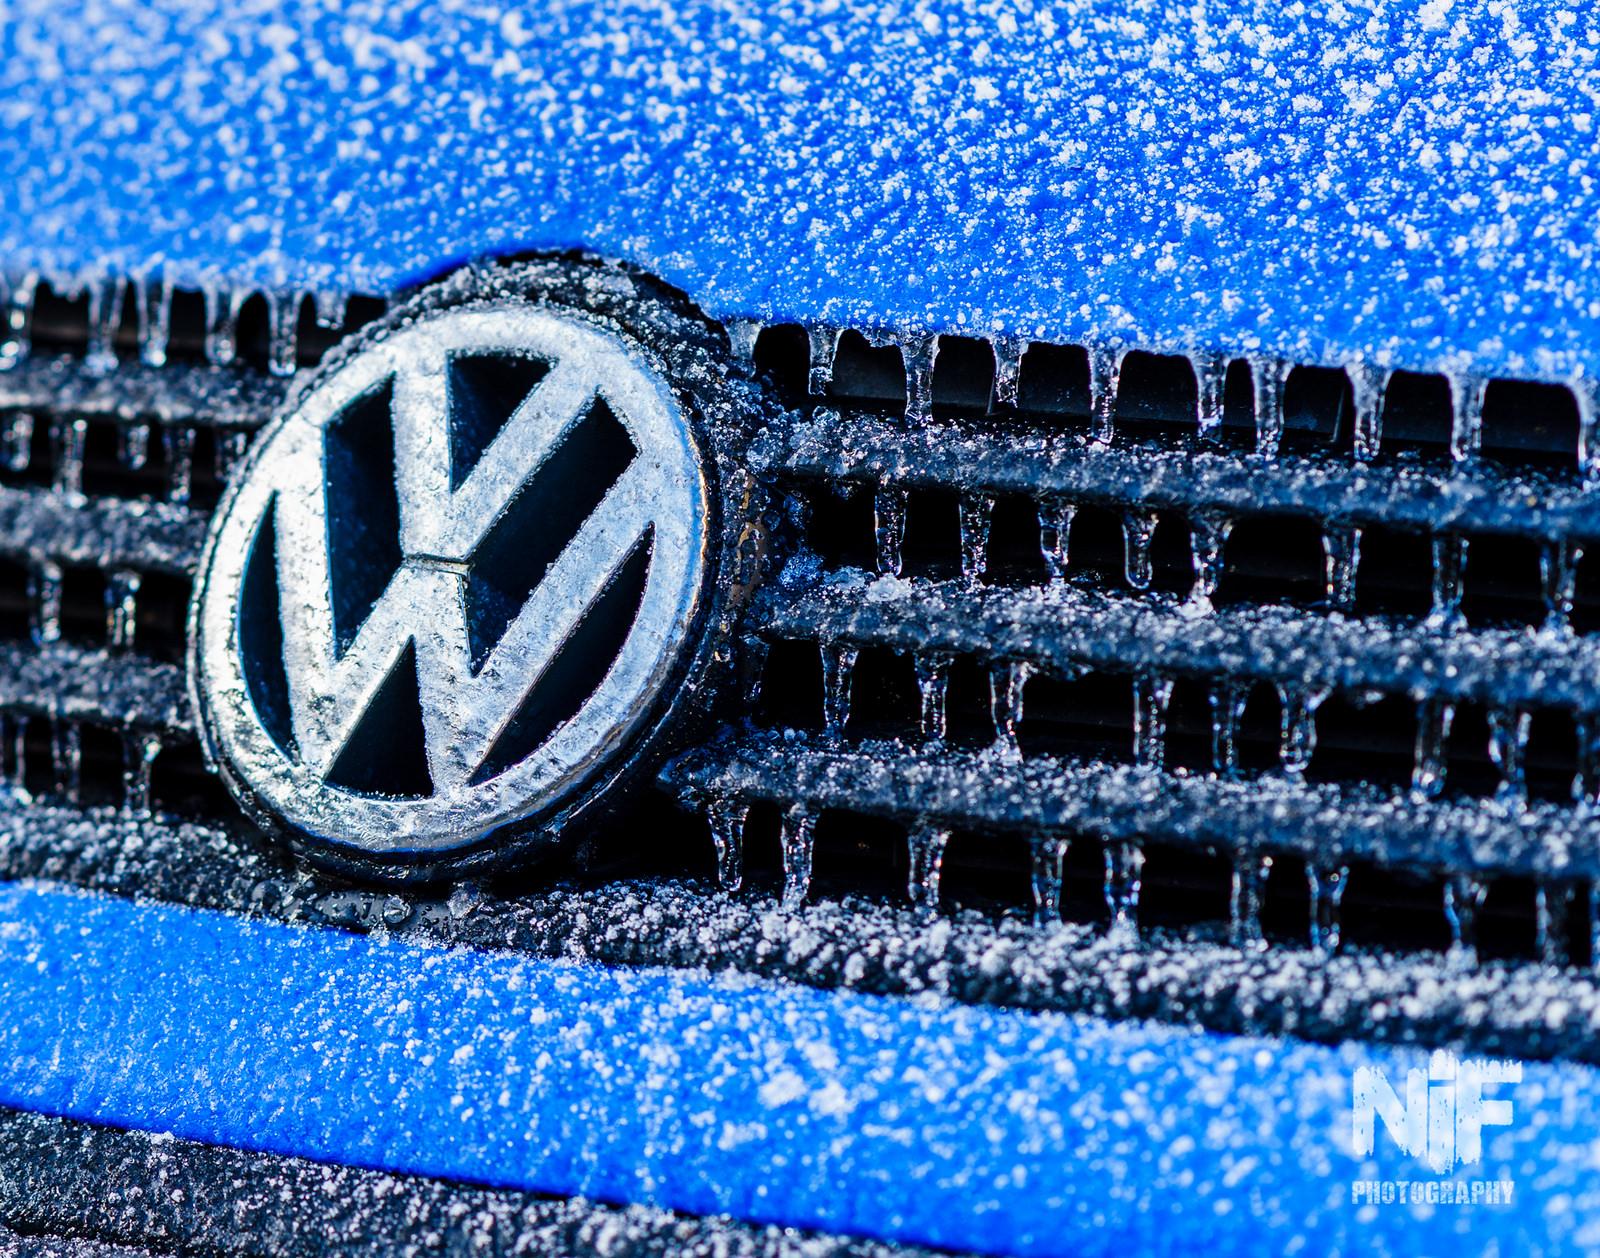 VW droht nach dem Abgasskandal eine Milliardenstrafe.